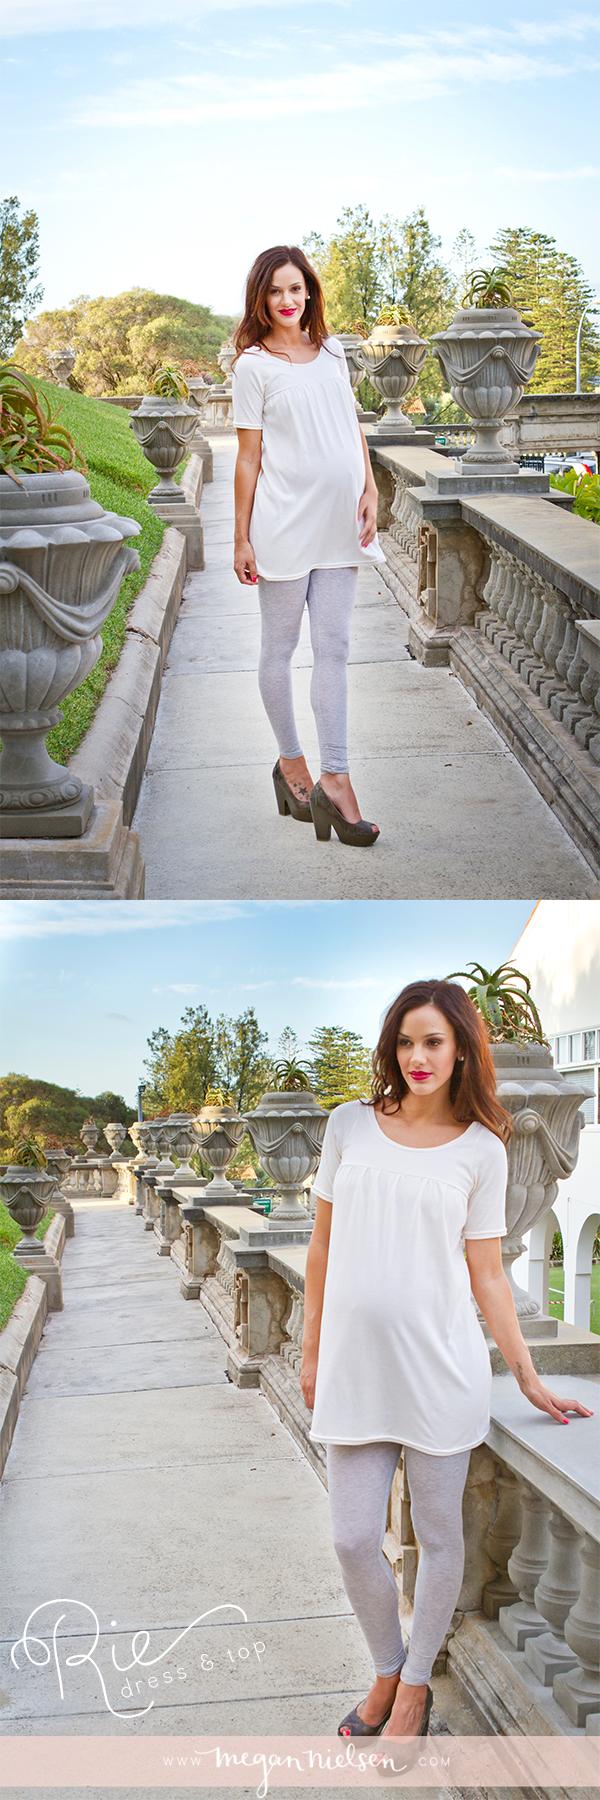 Megan Nielsen Rie dress & top sewing pattern MN1005 // @megan_nielsen